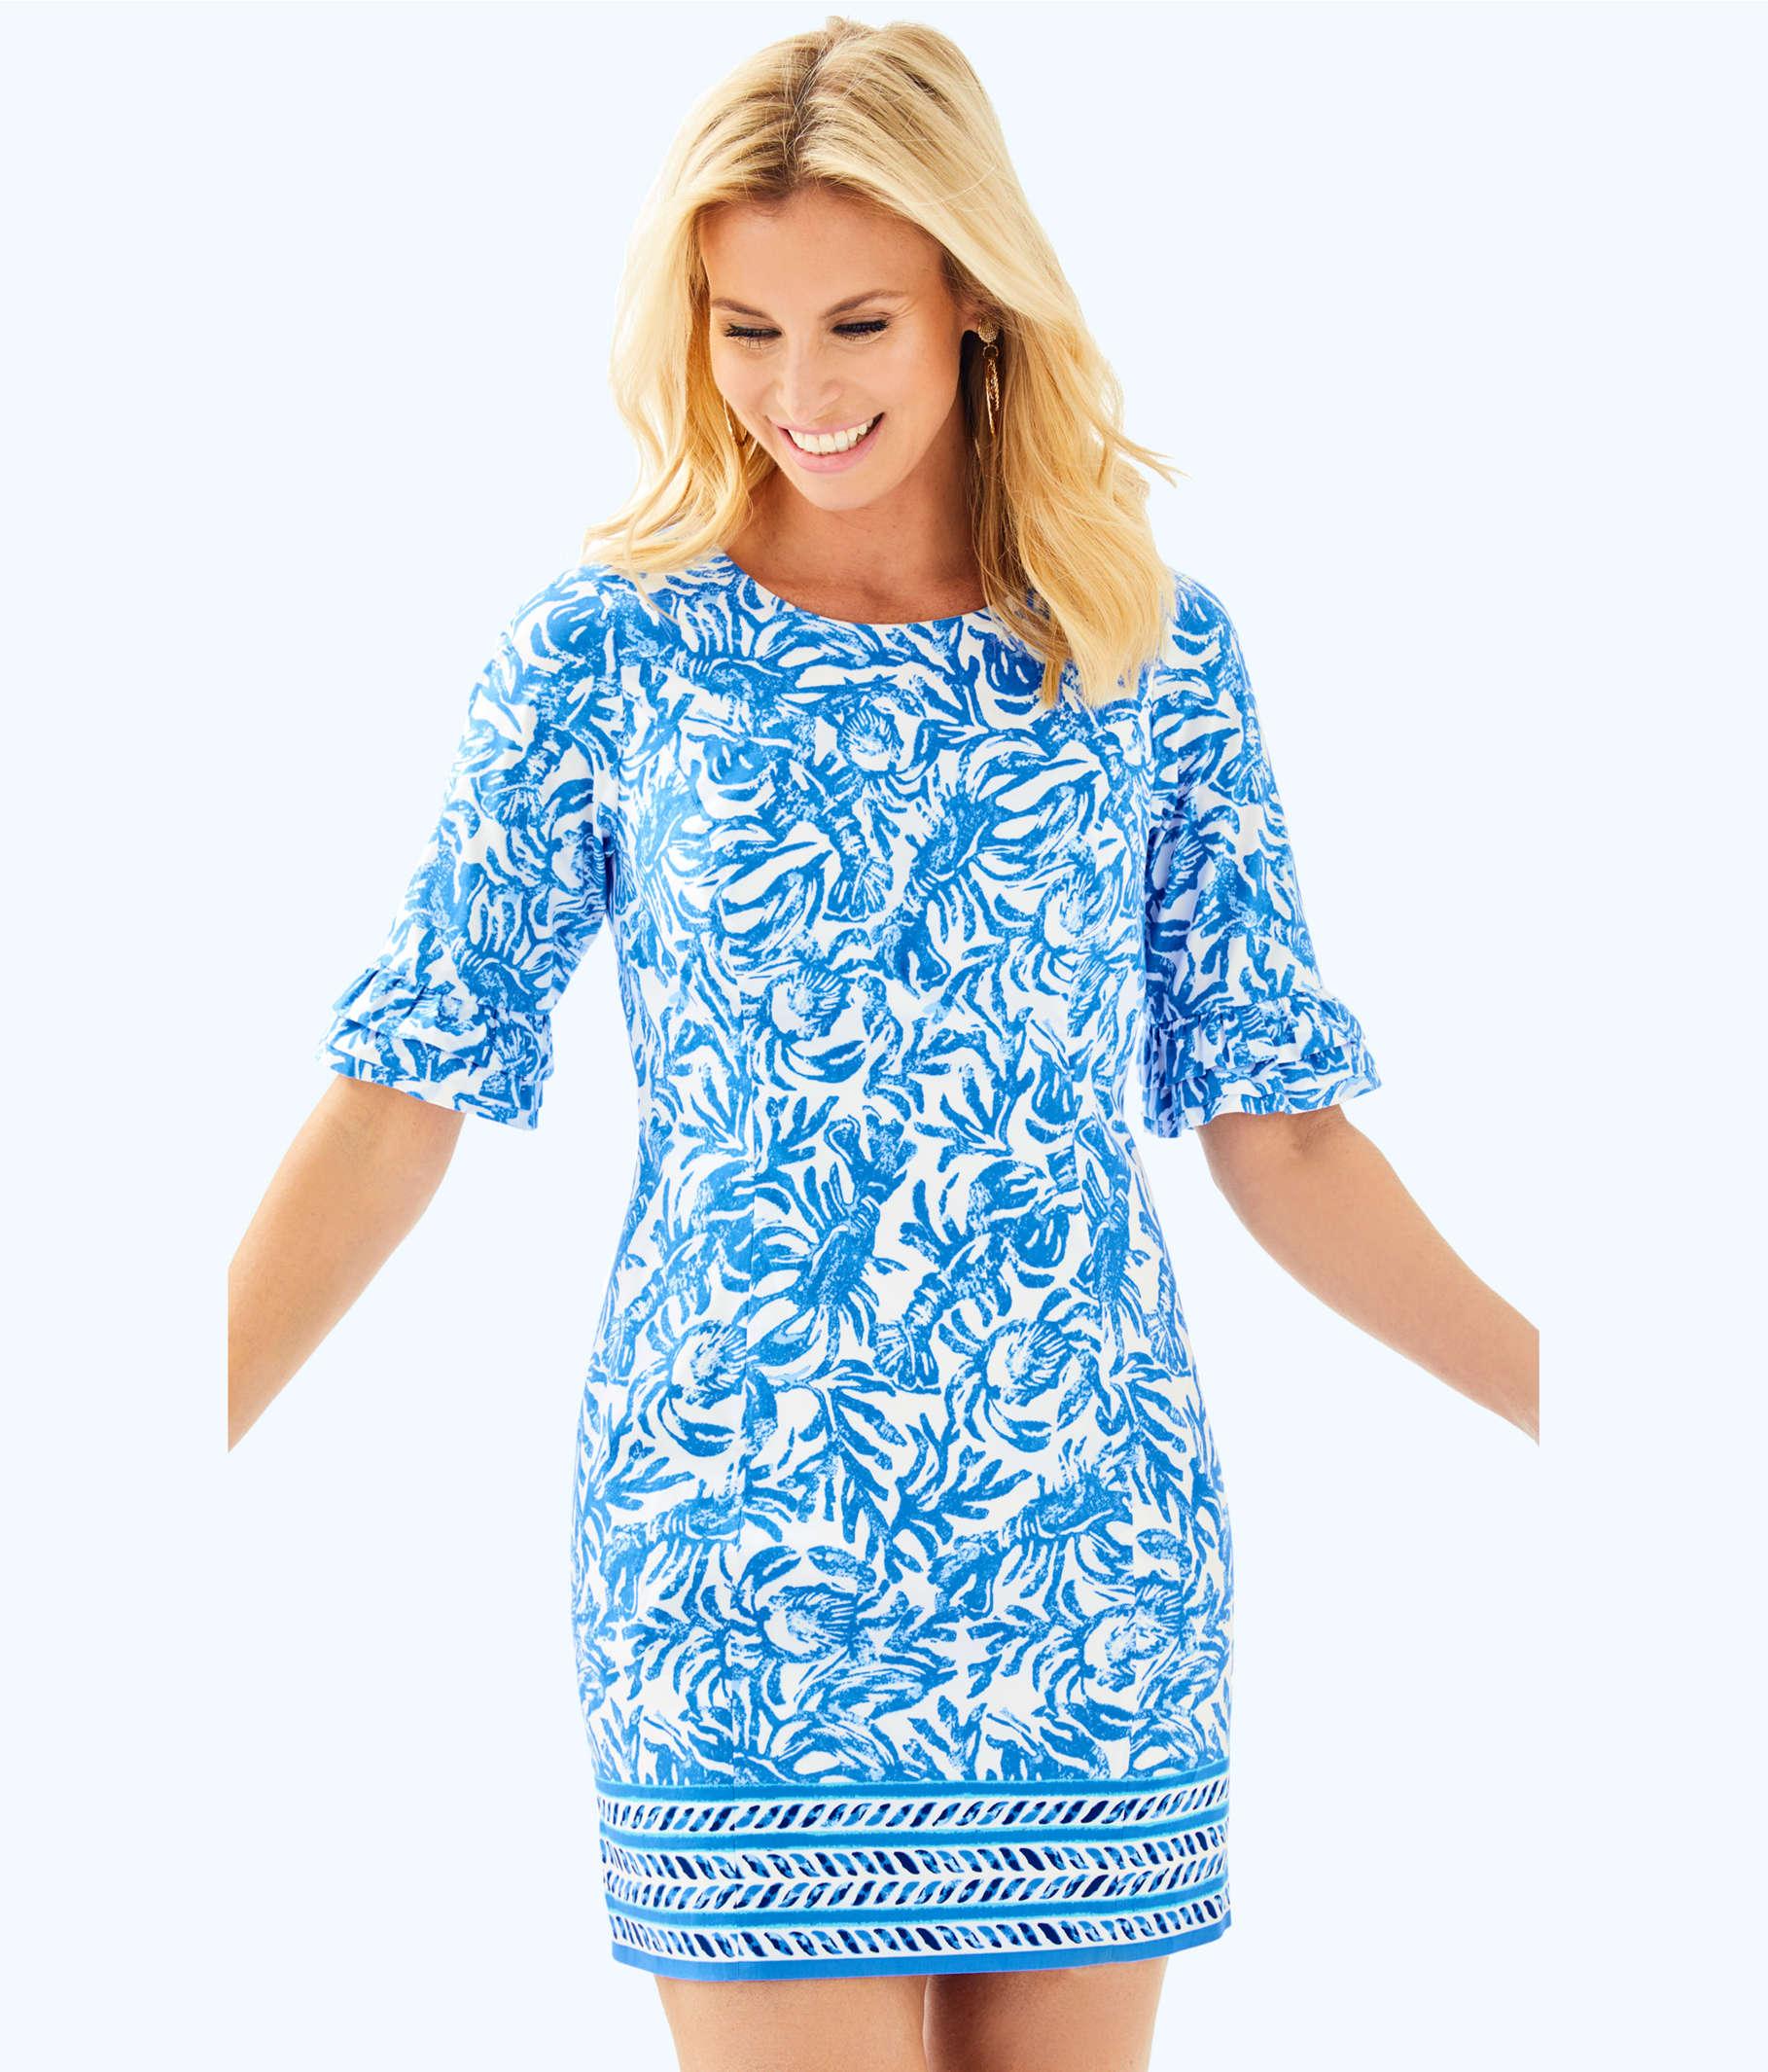 Fiesta Stretch Dress | 29055 | Lilly Pulitzer